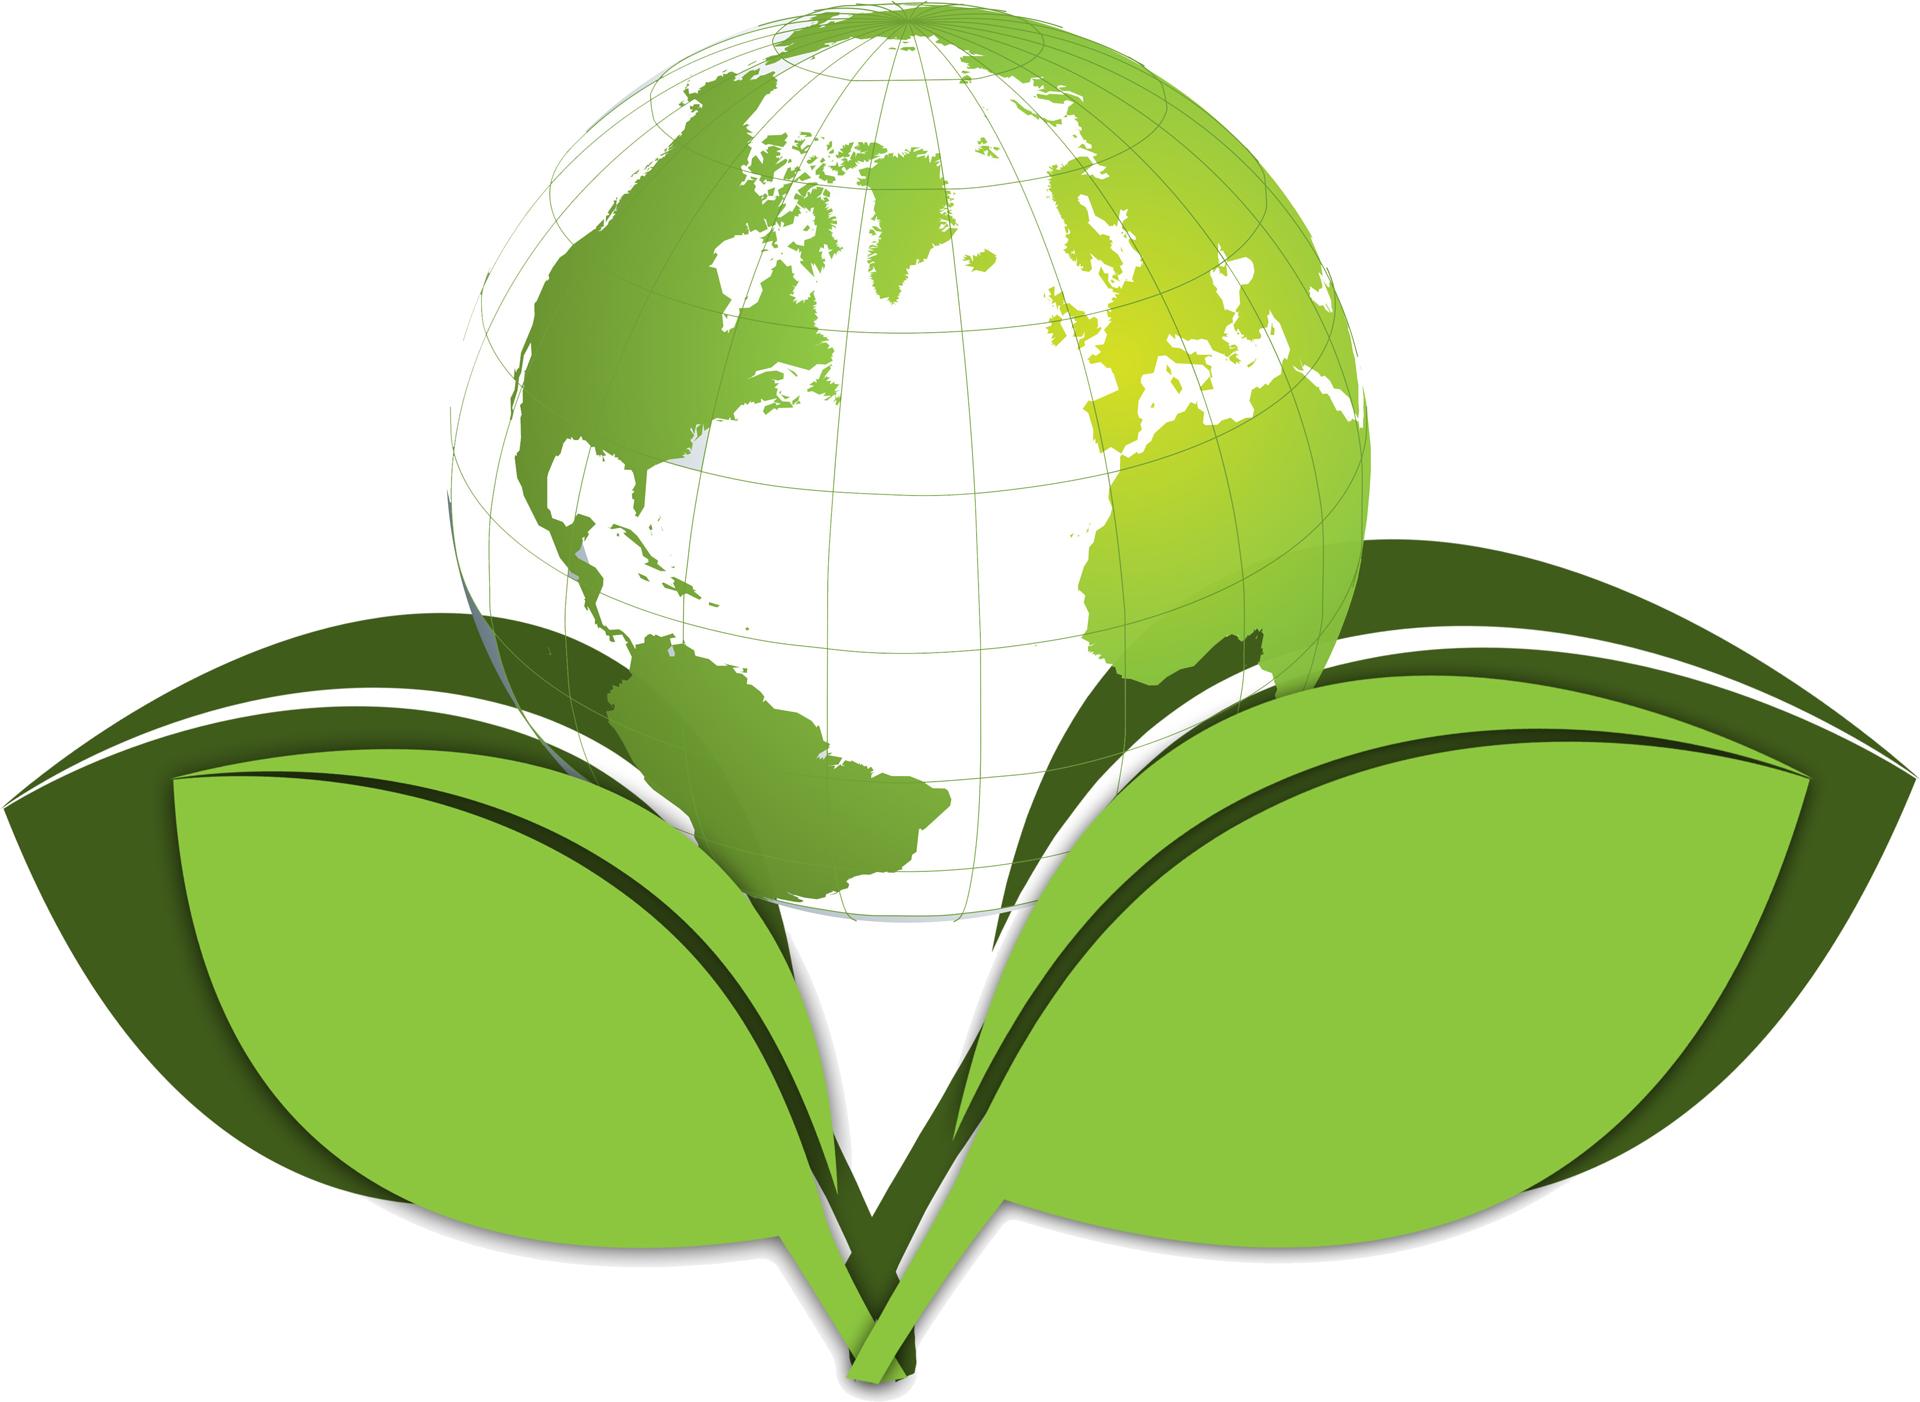 kisspng-globe-earth-world-5b0925e7bf5810.1121714015273261837838